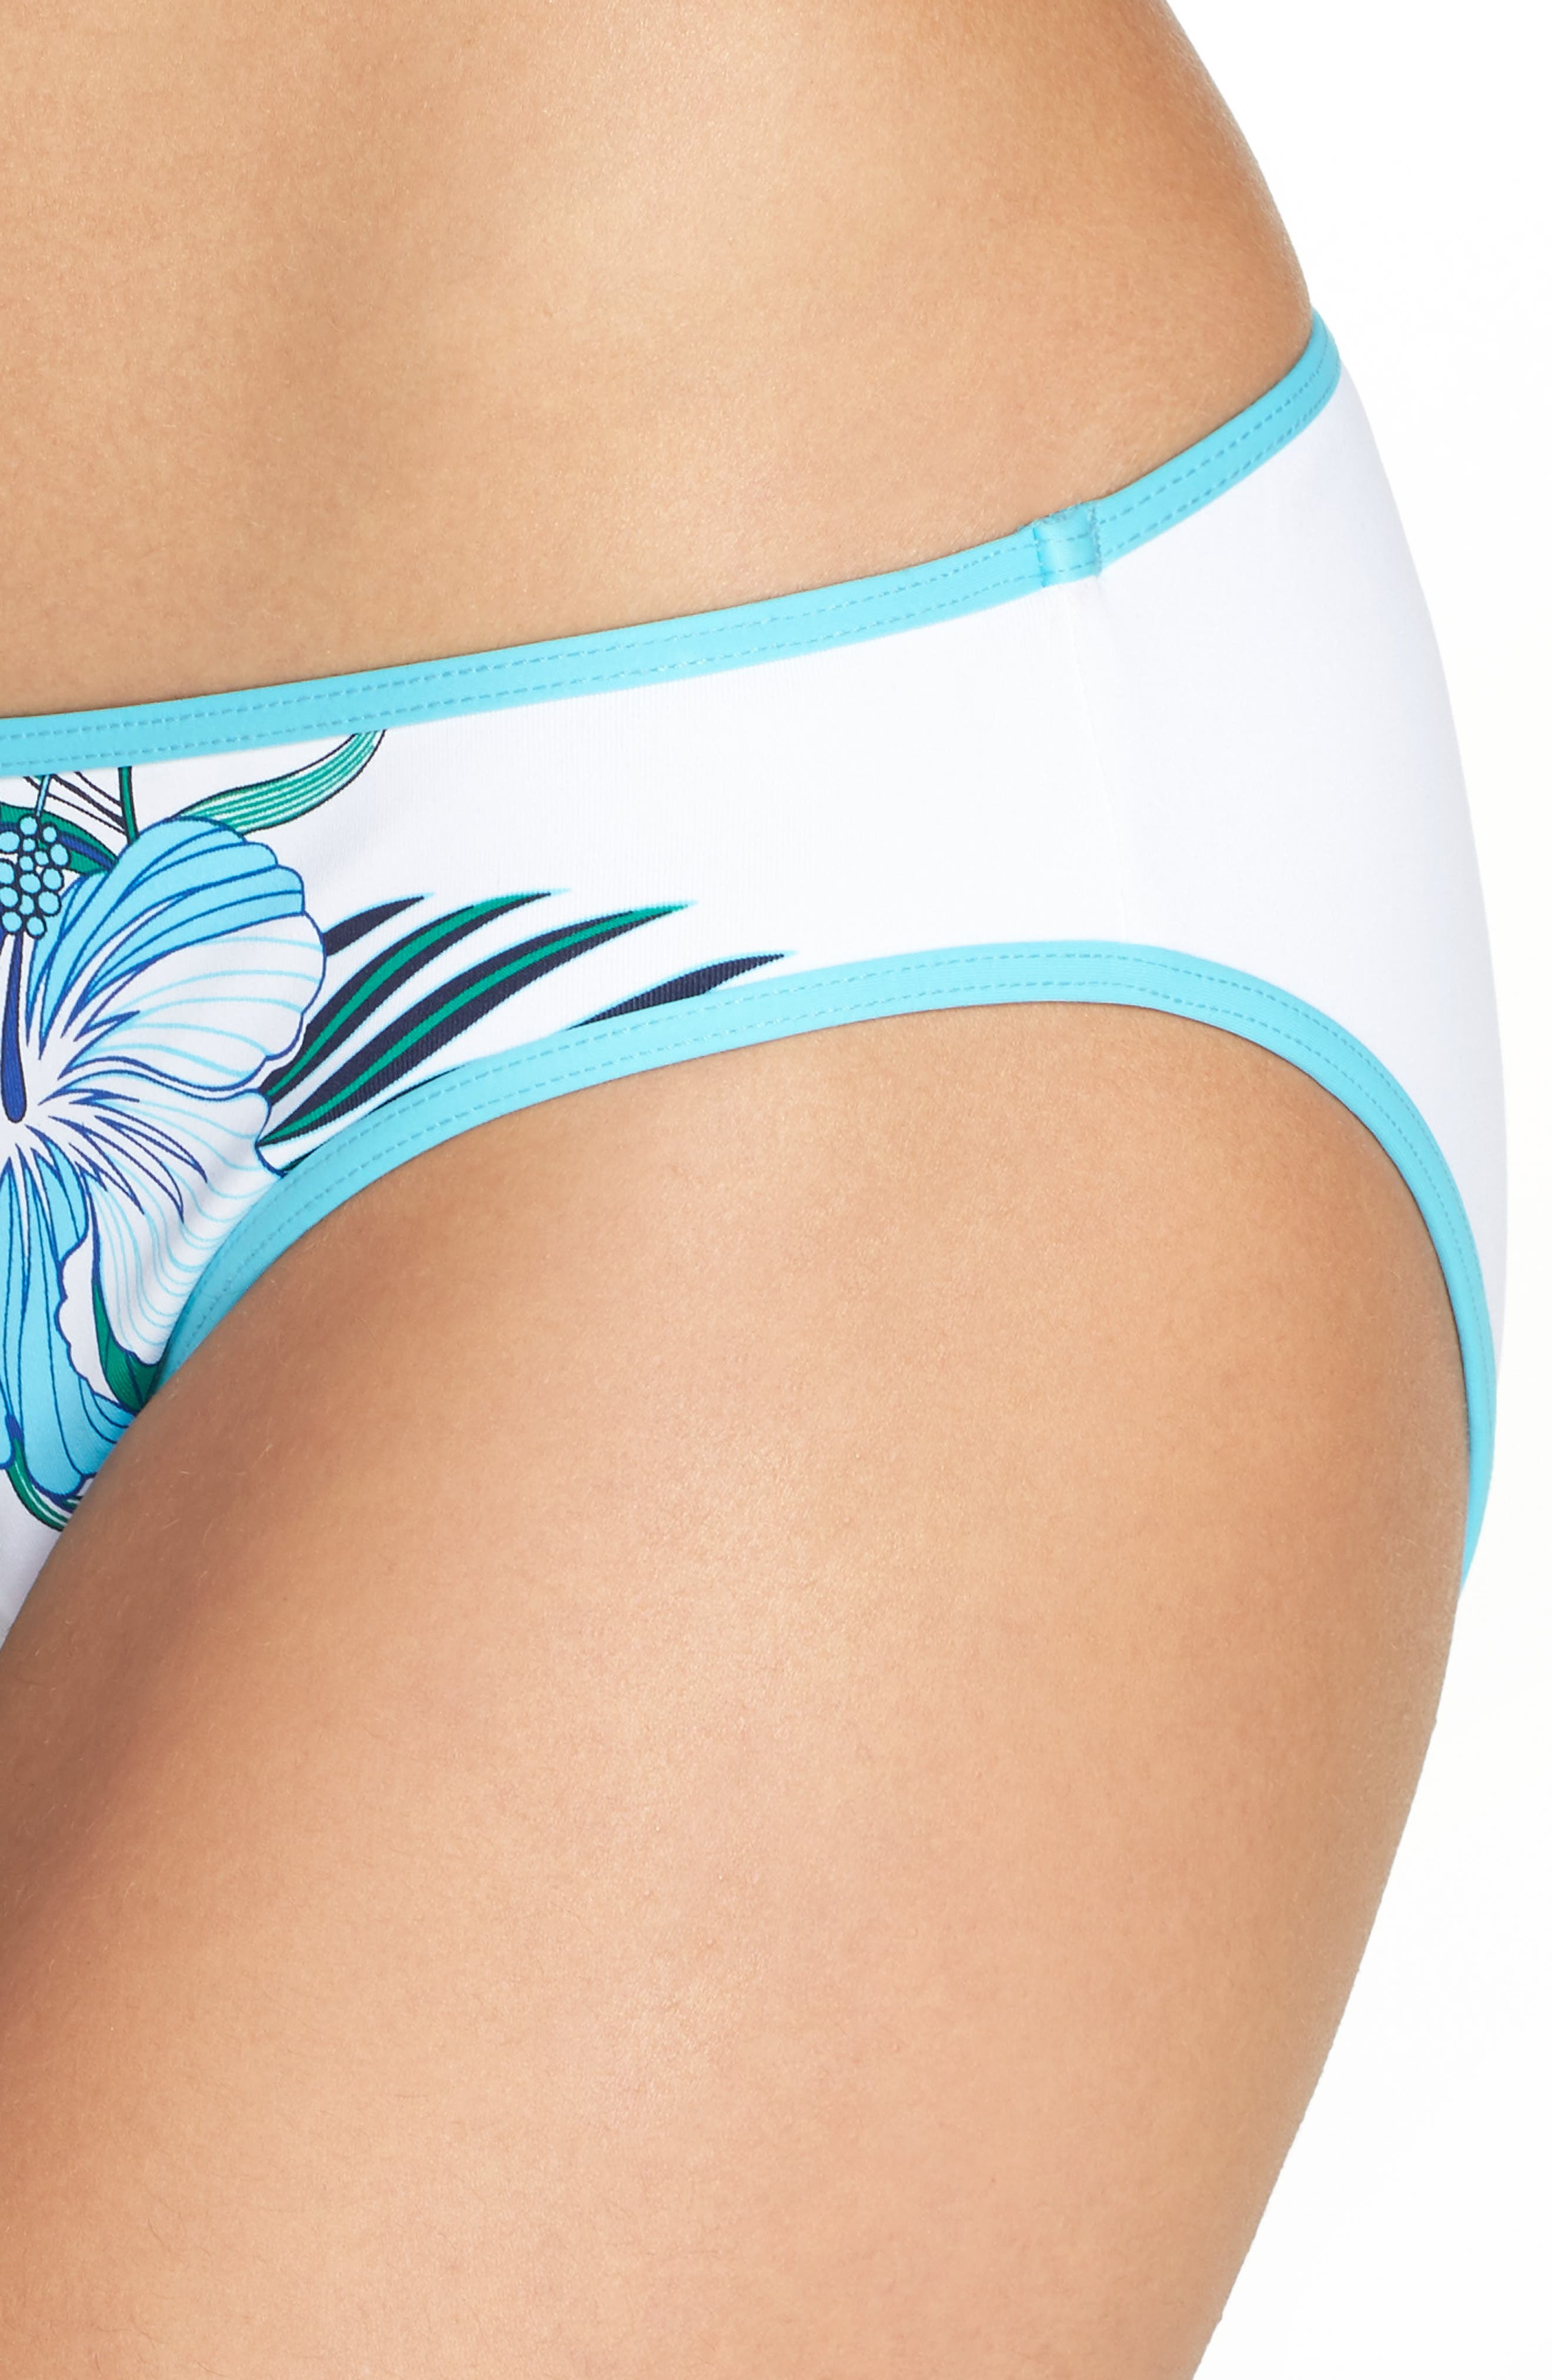 Hibiscus Print Bikini Bottoms,                             Alternate thumbnail 4, color,                             100